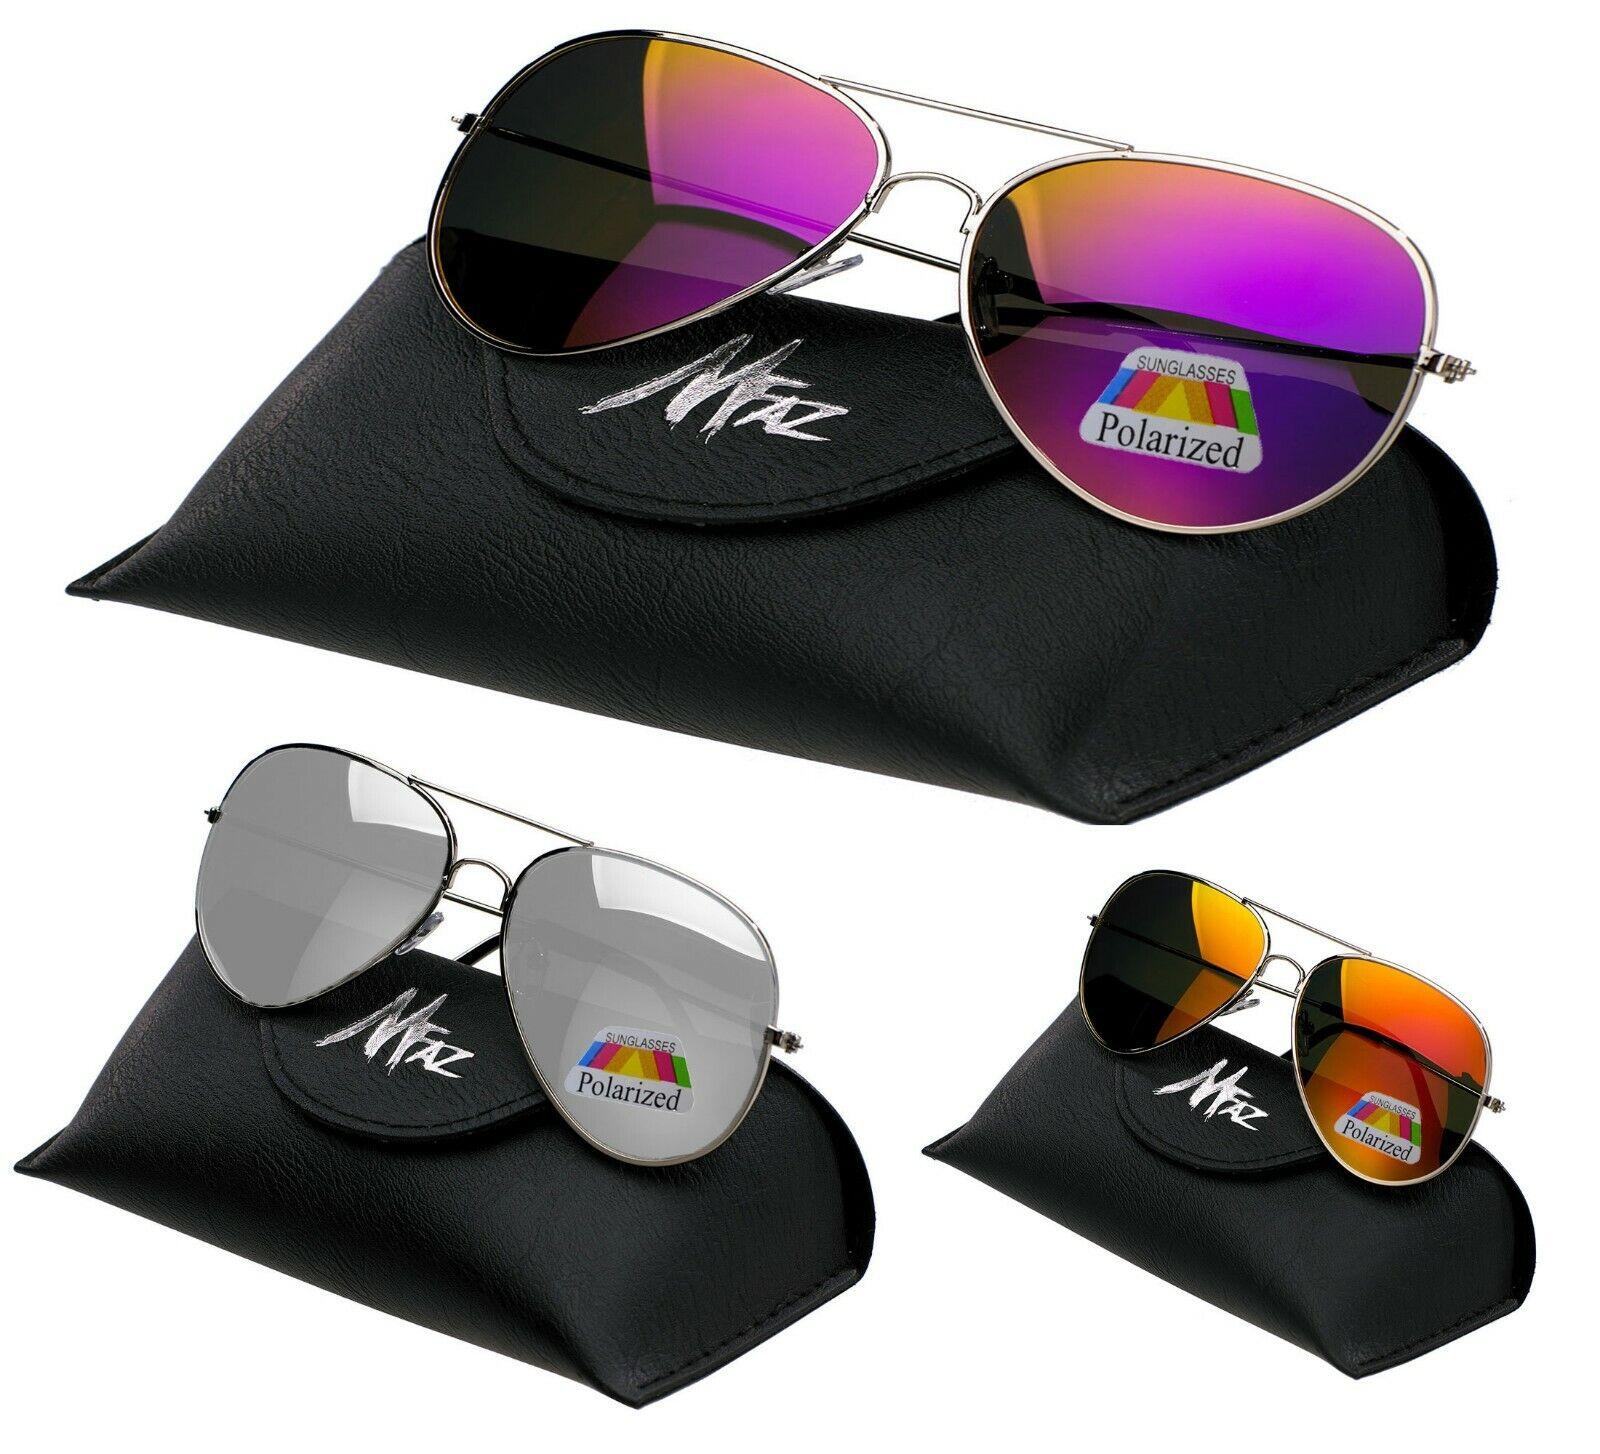 Herren Damen Pilot Verspiegelt Polarisiert Sonnenbrillen Mode 80er Shades